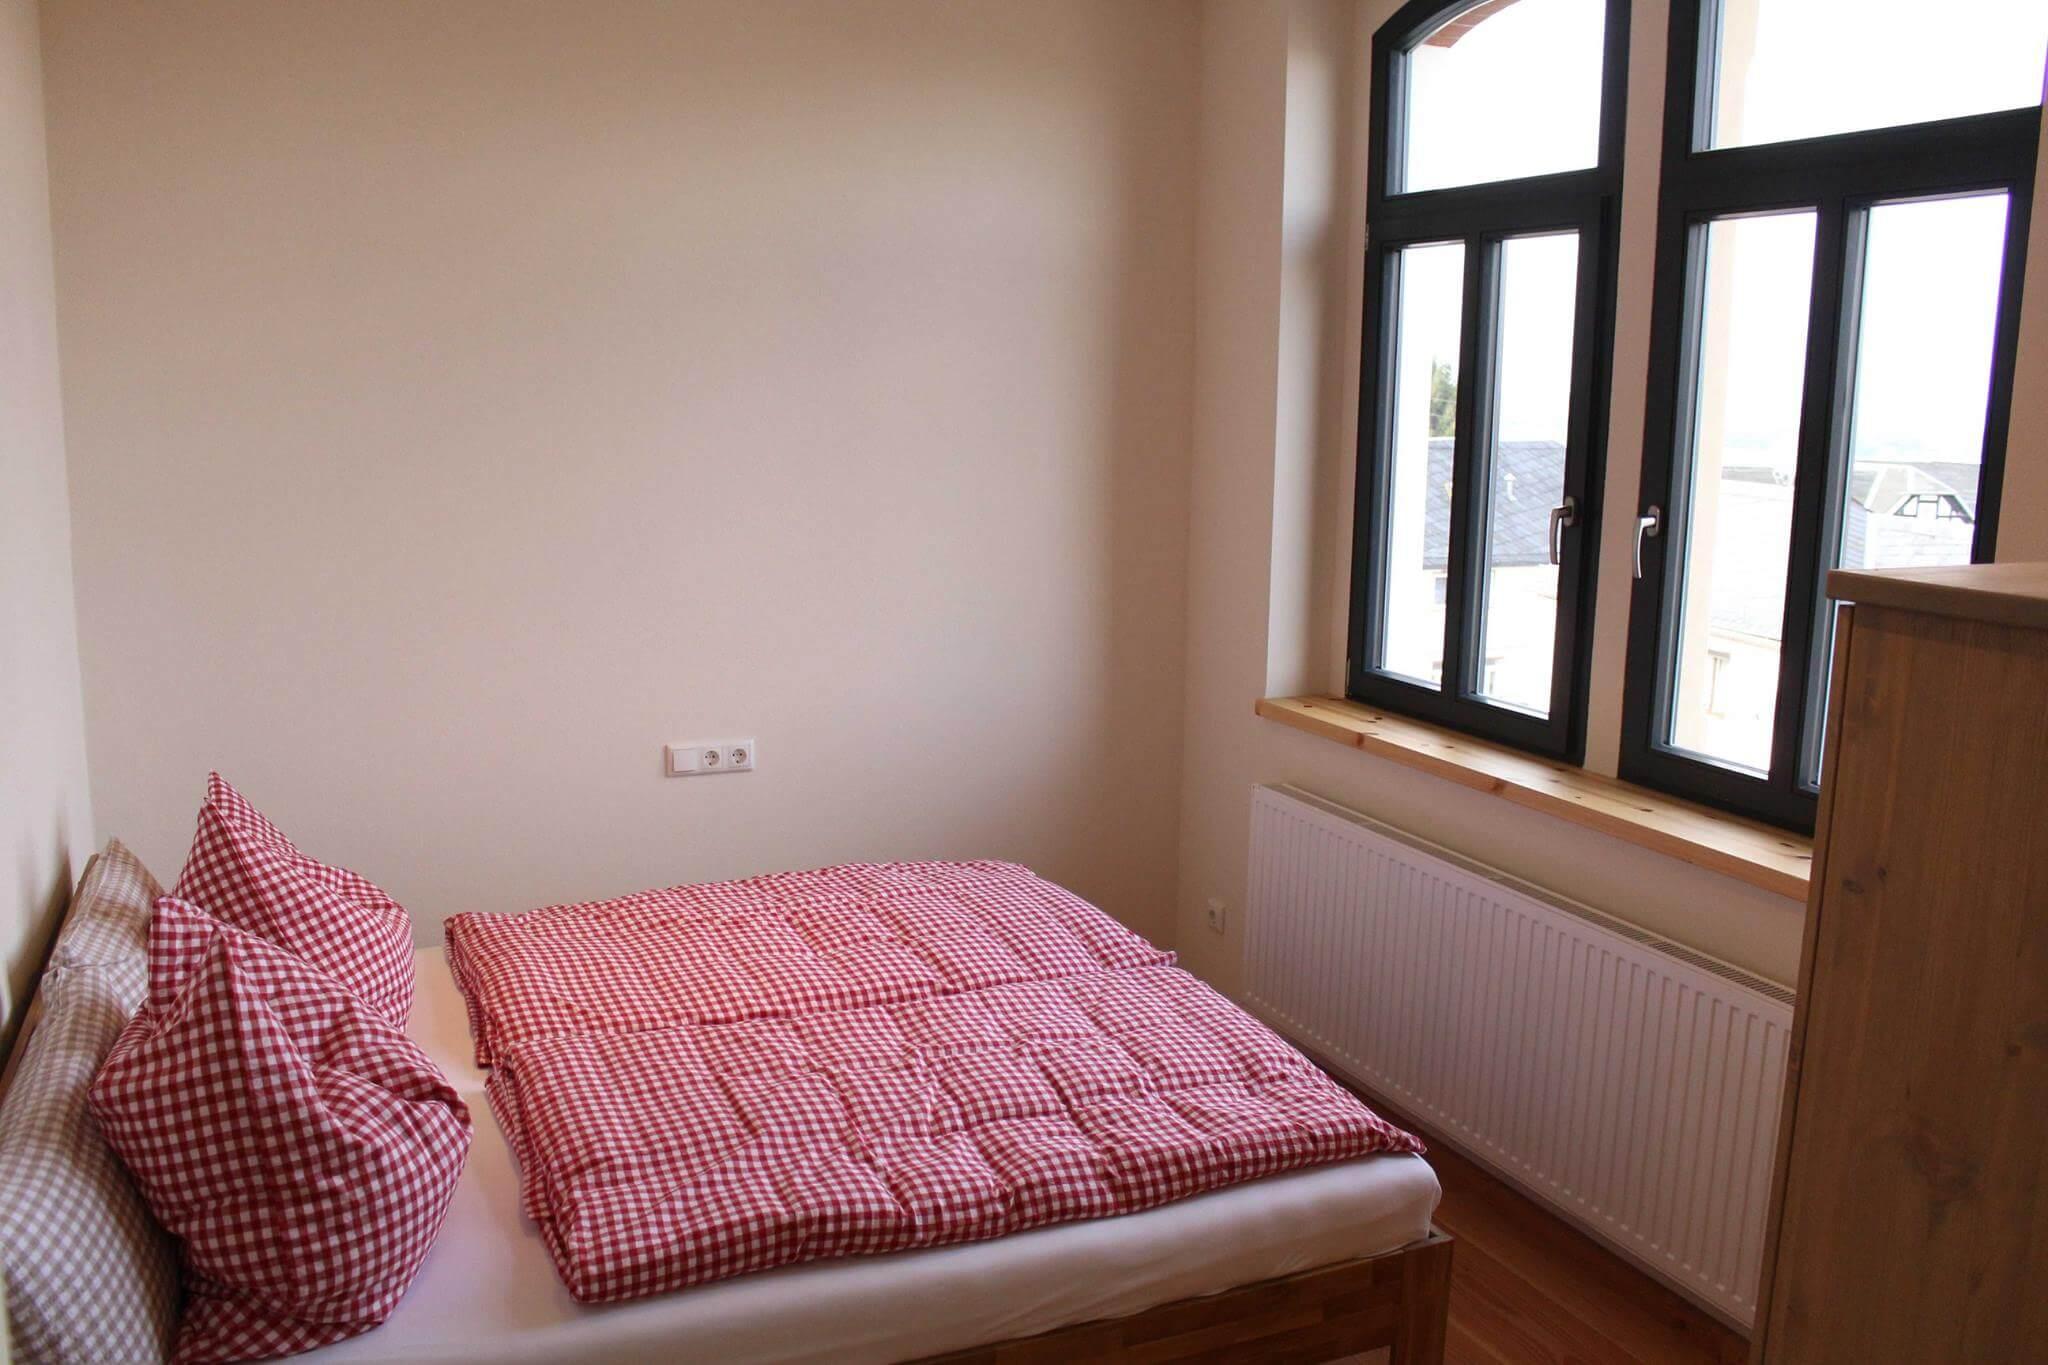 Hotel Turmschule Zeulenroda Klassenzimmer 04, Bett